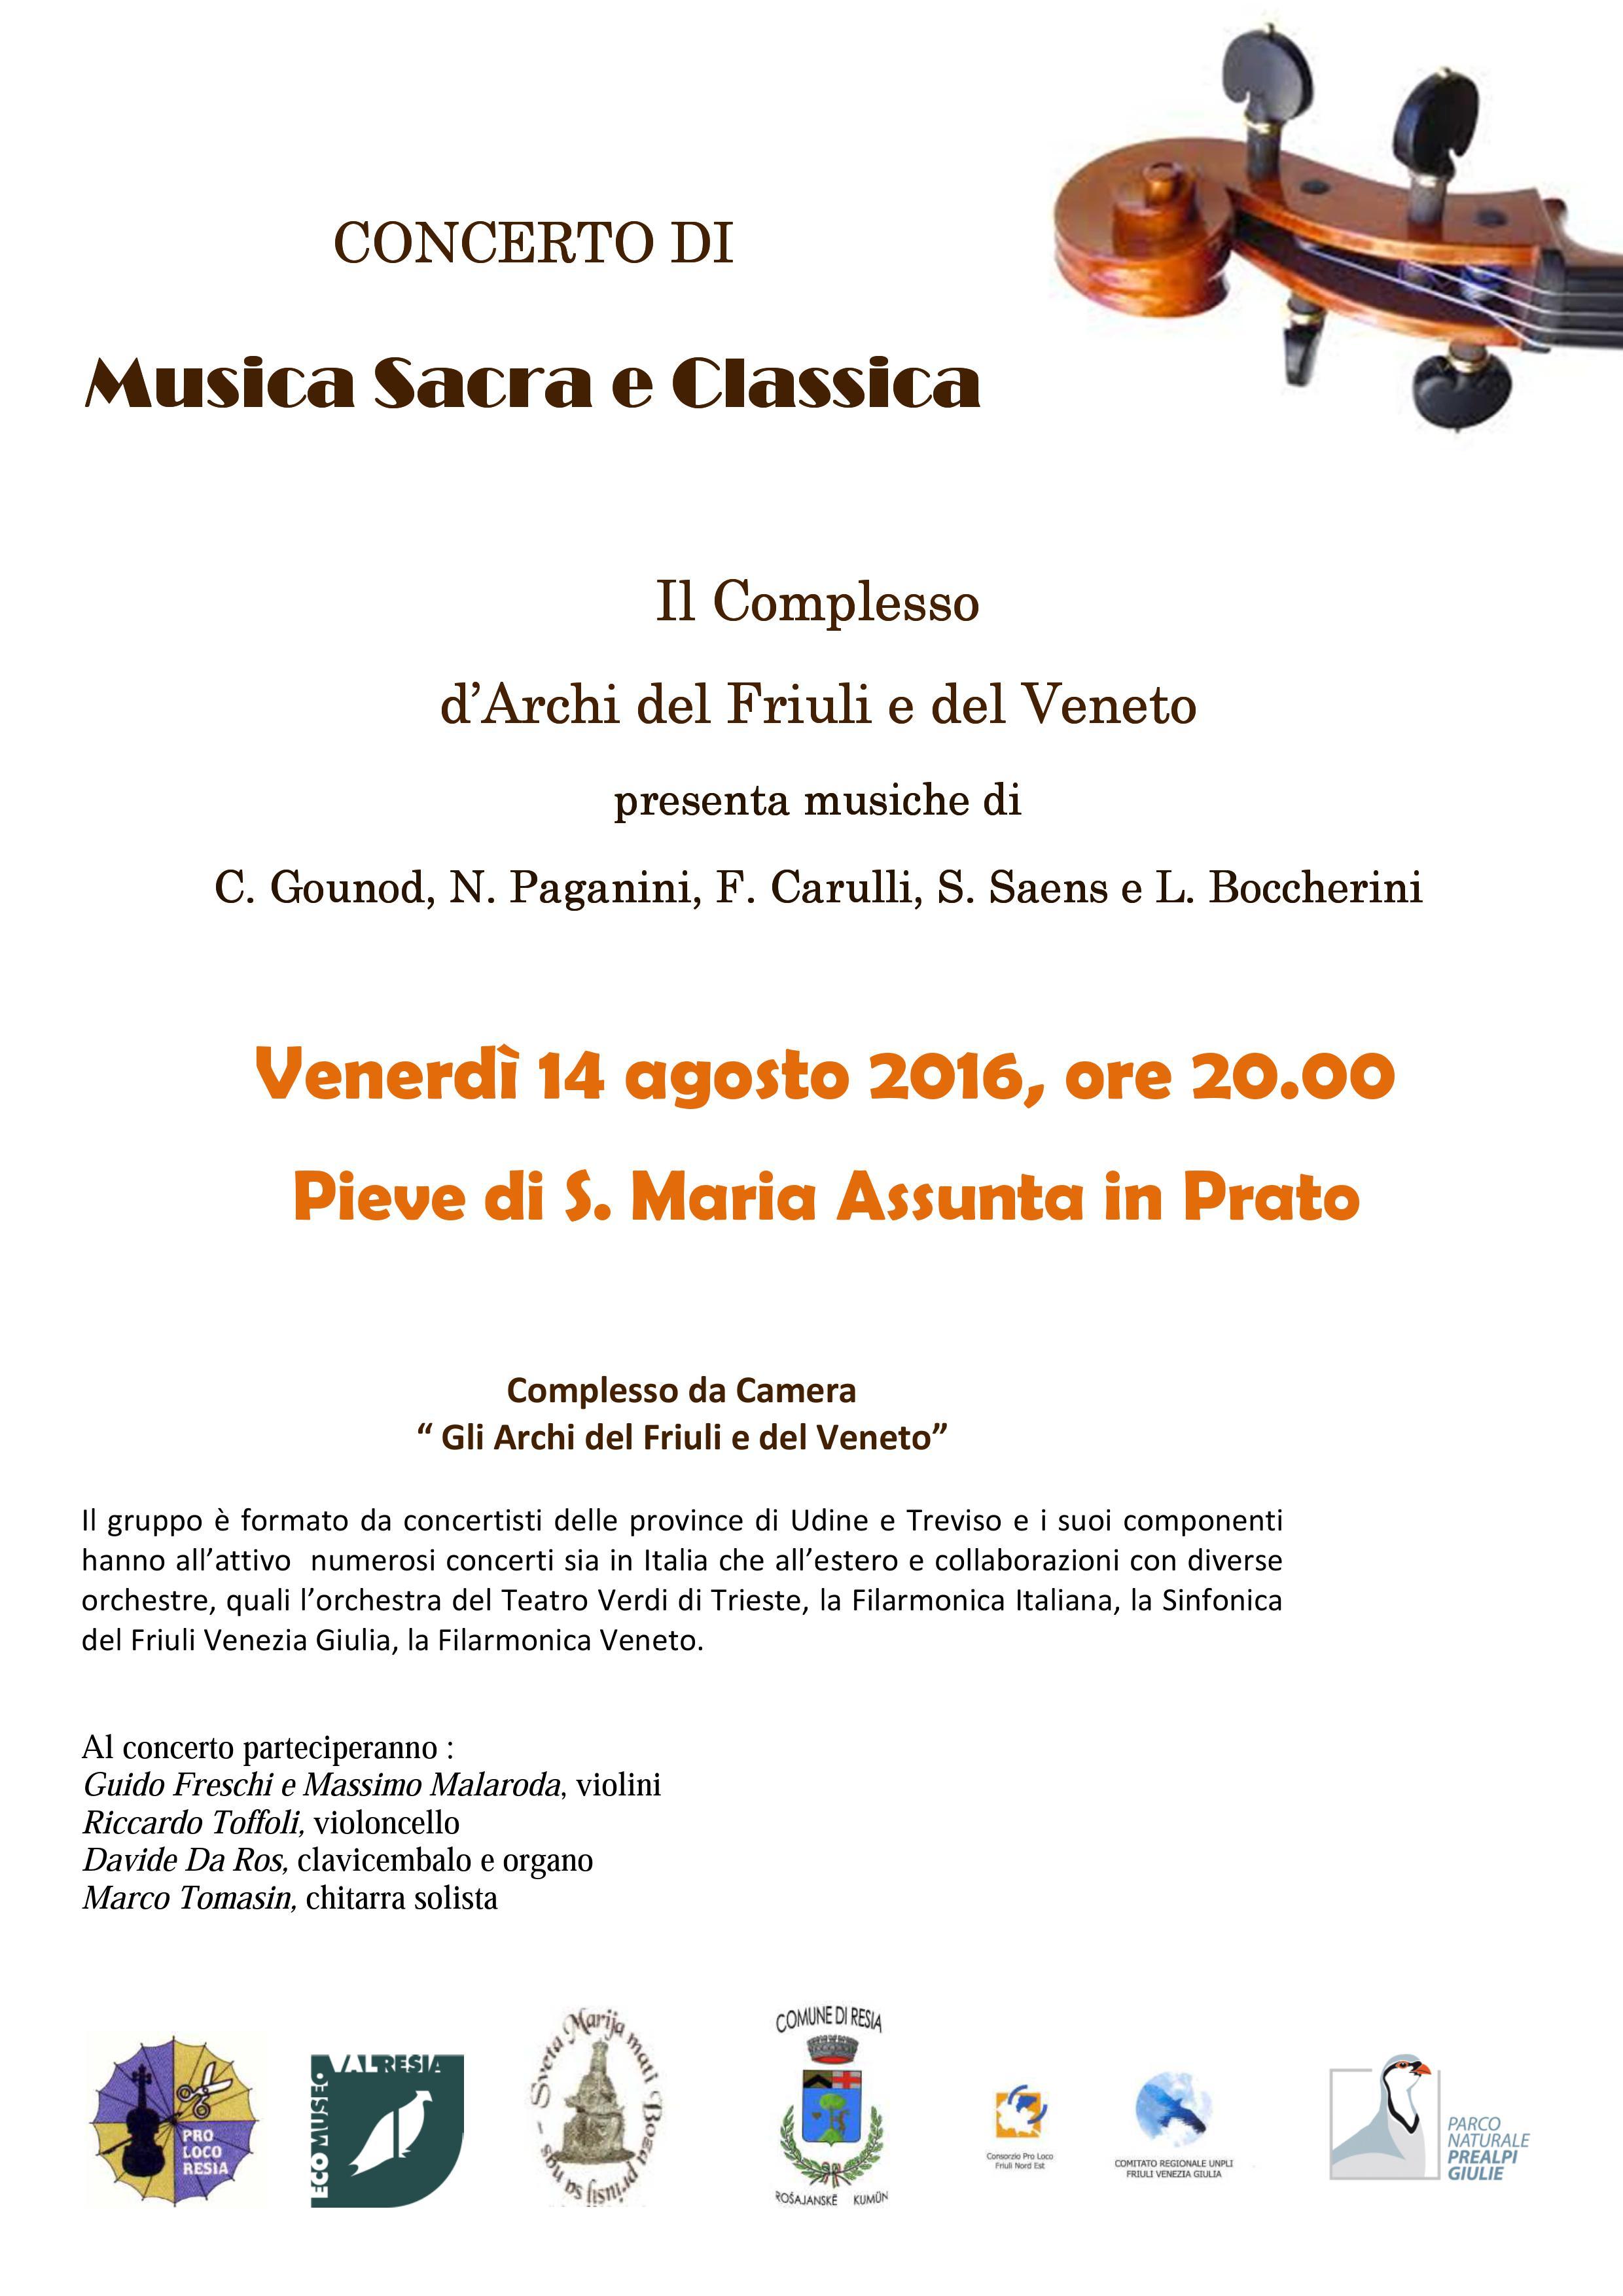 Concerto d'Archi 14.8.2016